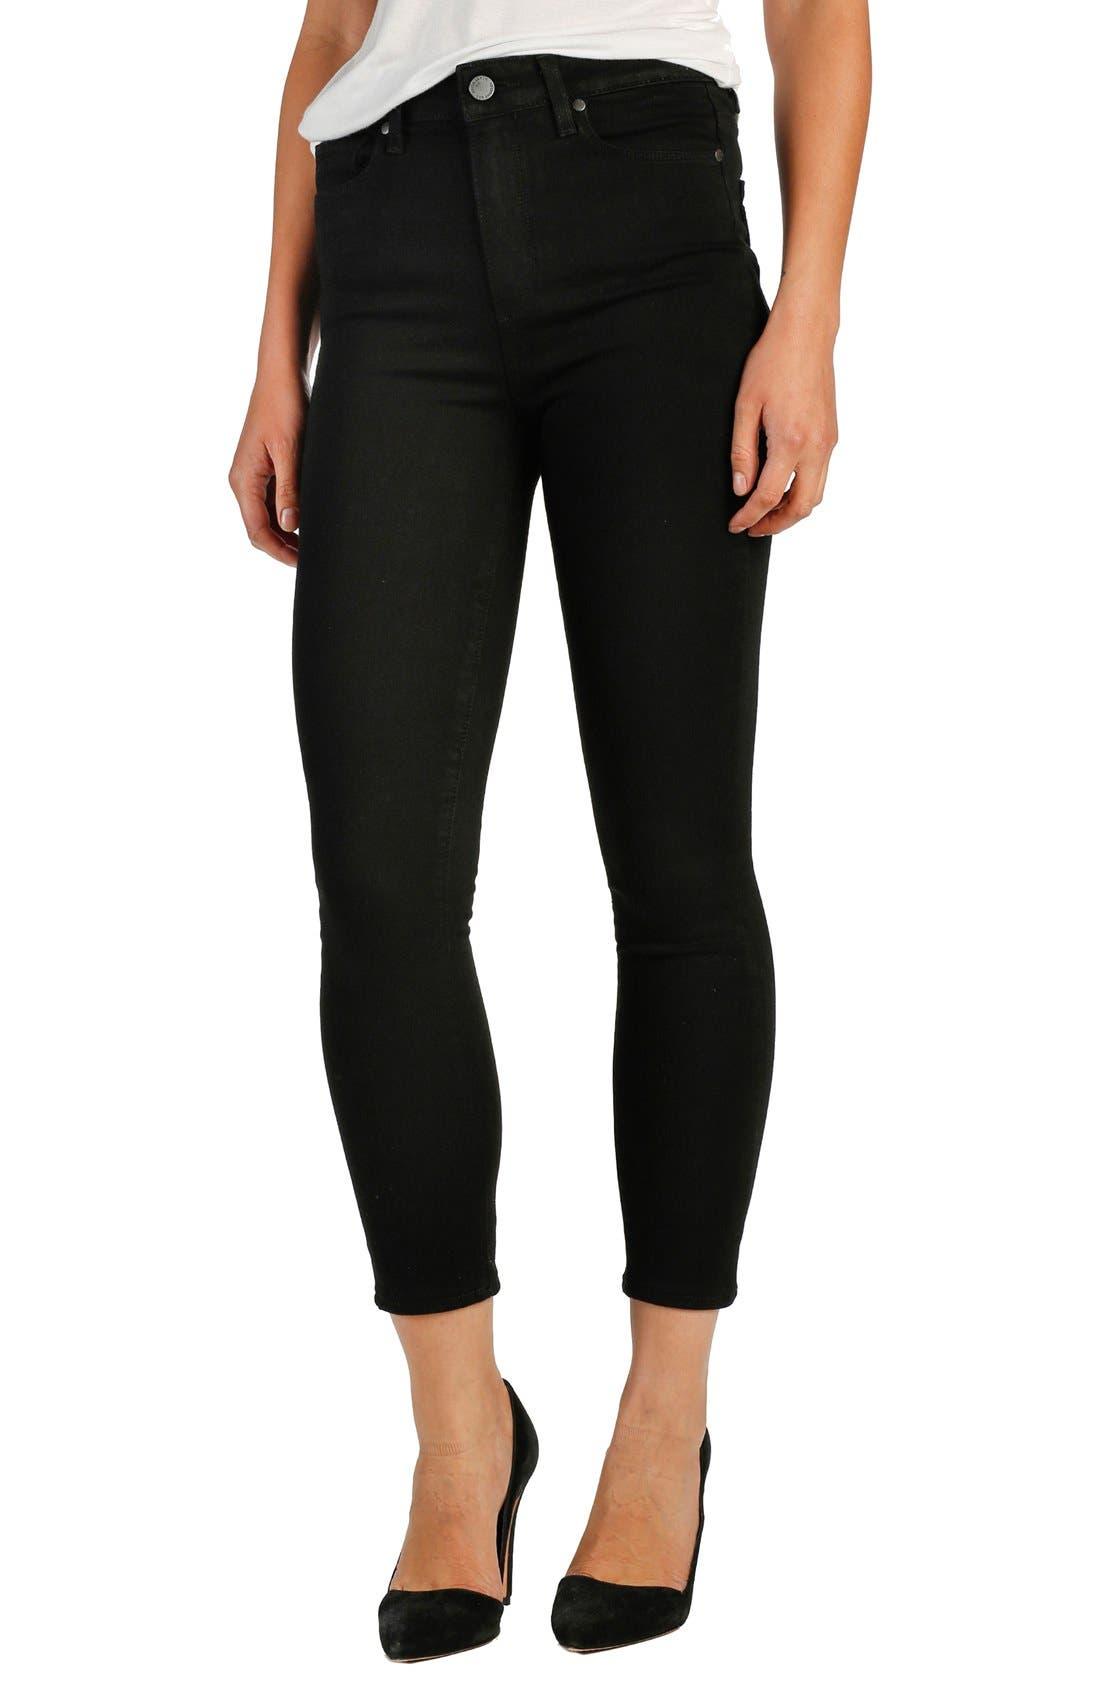 Main Image - PAIGE Transcend - Margot High Waist Crop Ultra Skinny Jeans (Black Shadow)